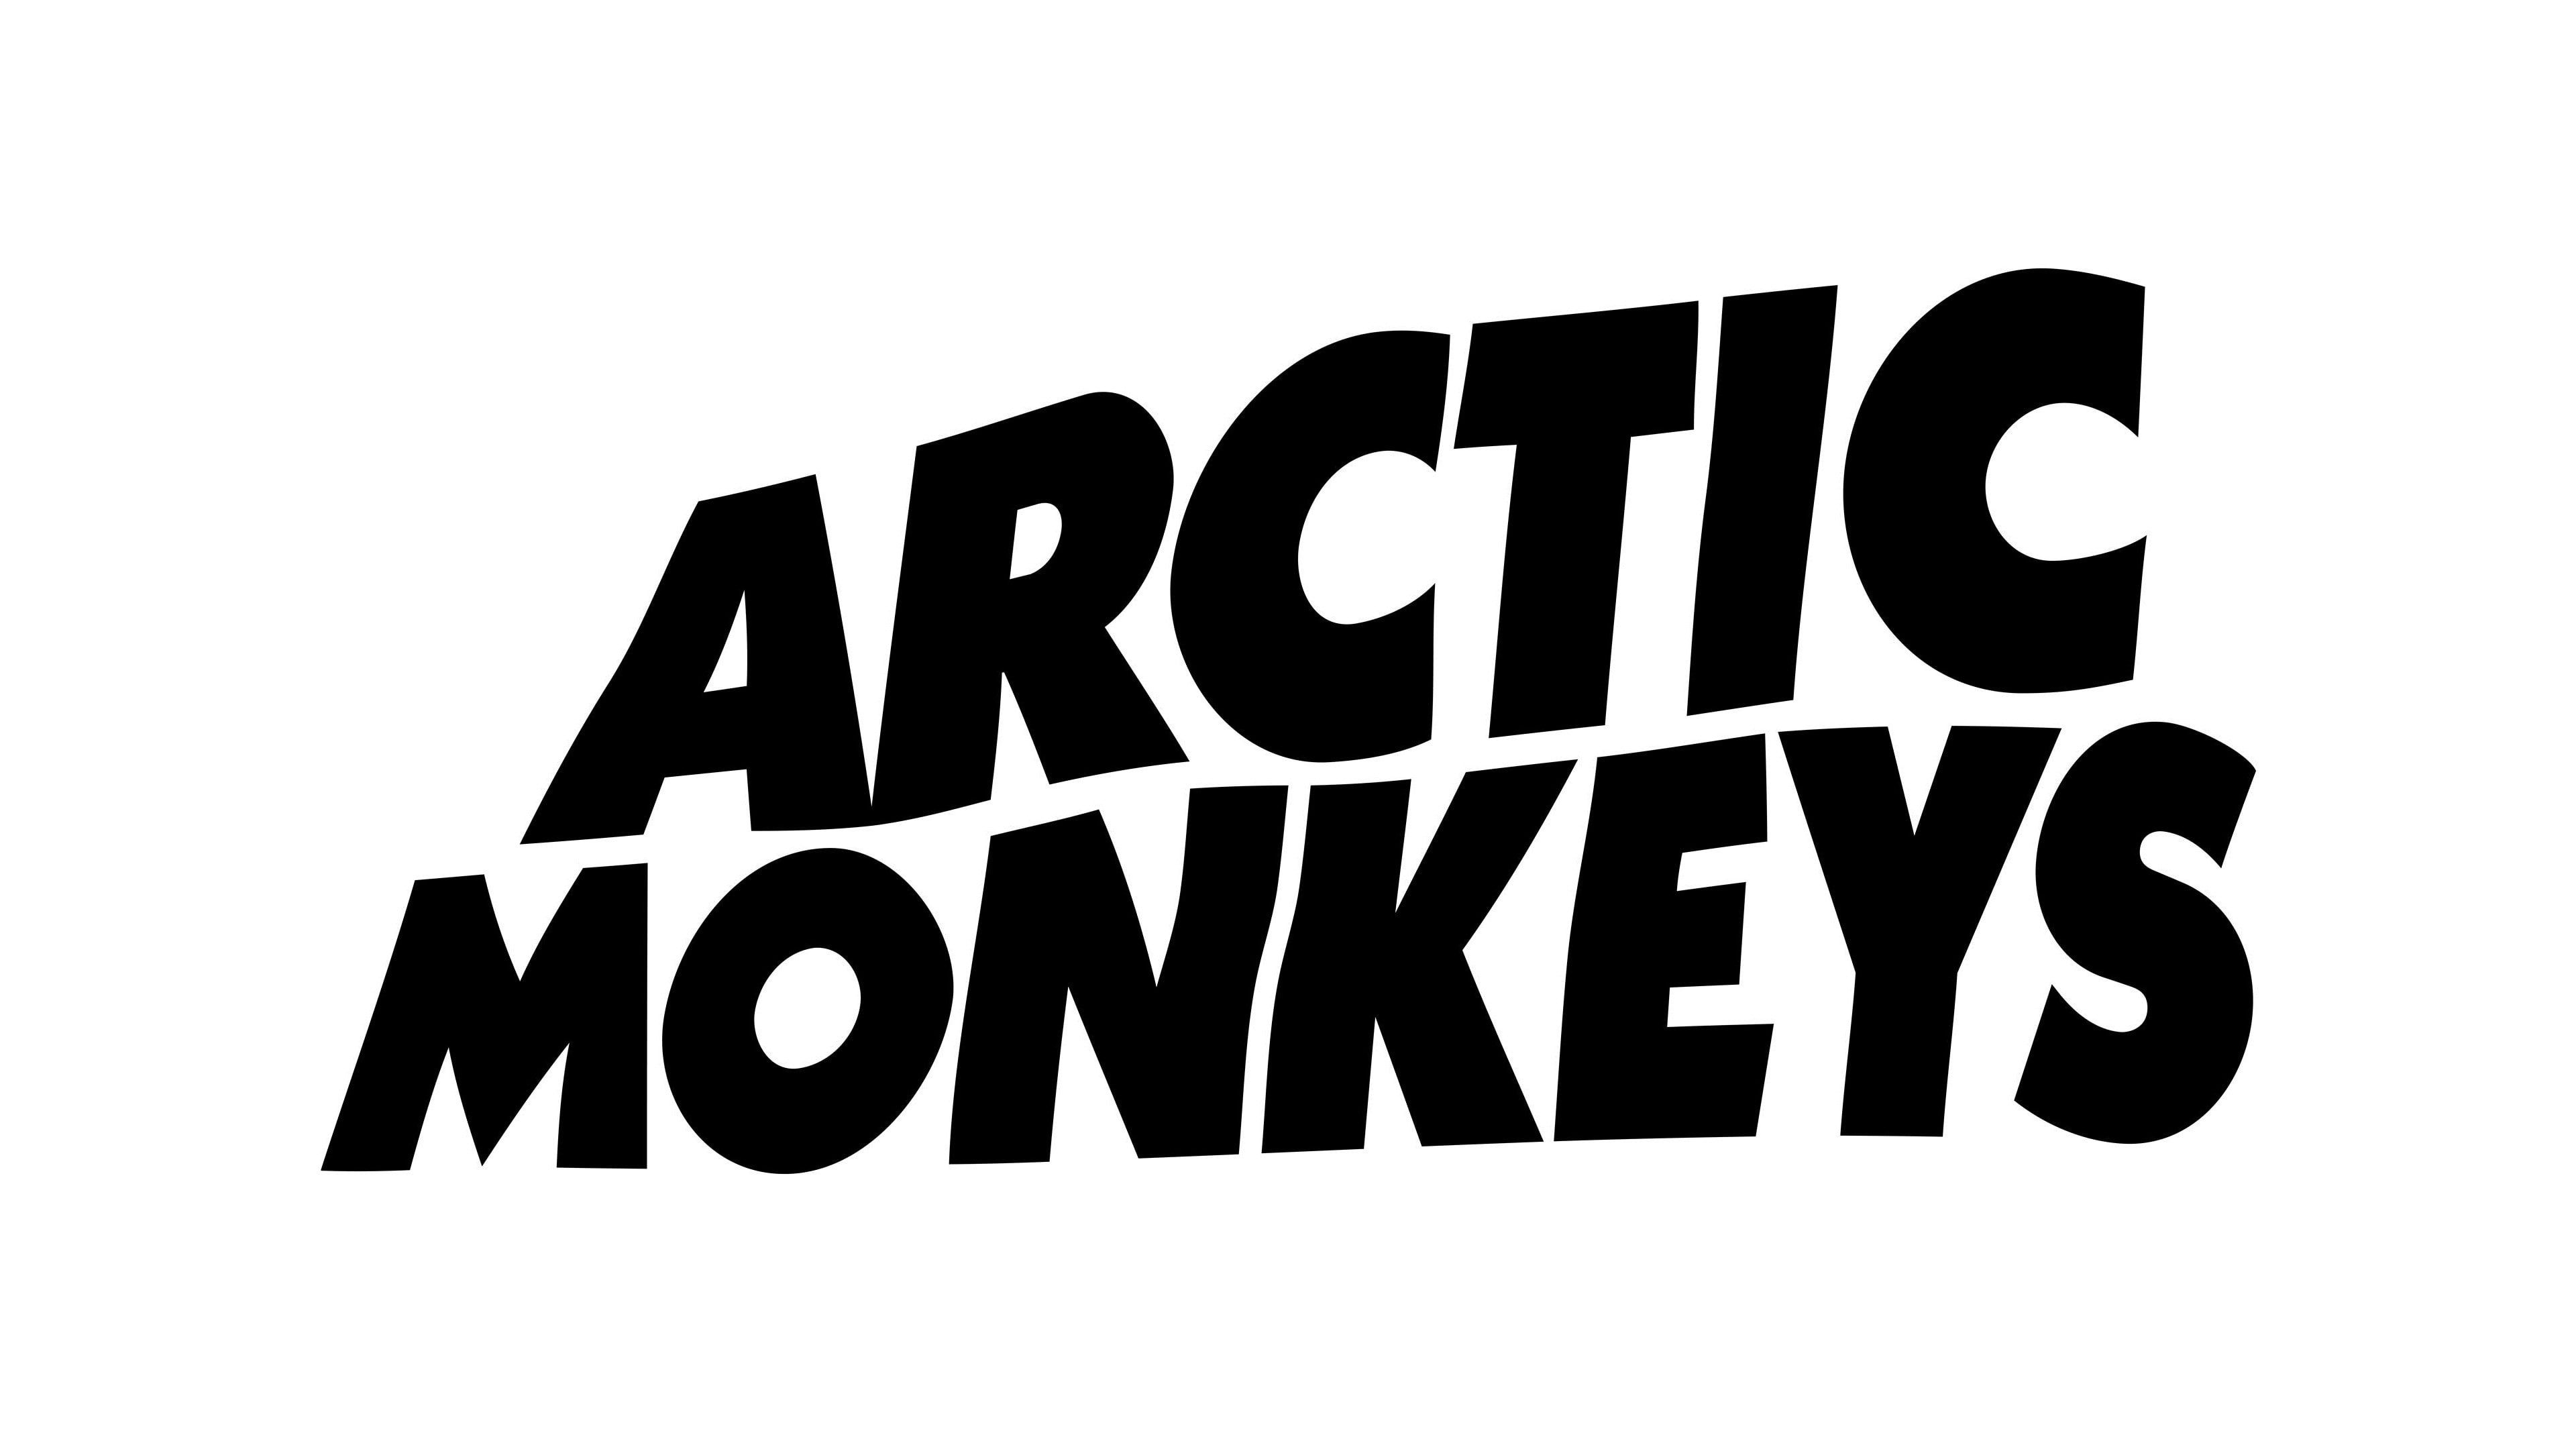 Arctic Monkeys Logo 4k Wallpaper Hdwallpaper Desktop Arctic Monkeys Wallpaper Arctic Monkeys Monkey Wallpaper